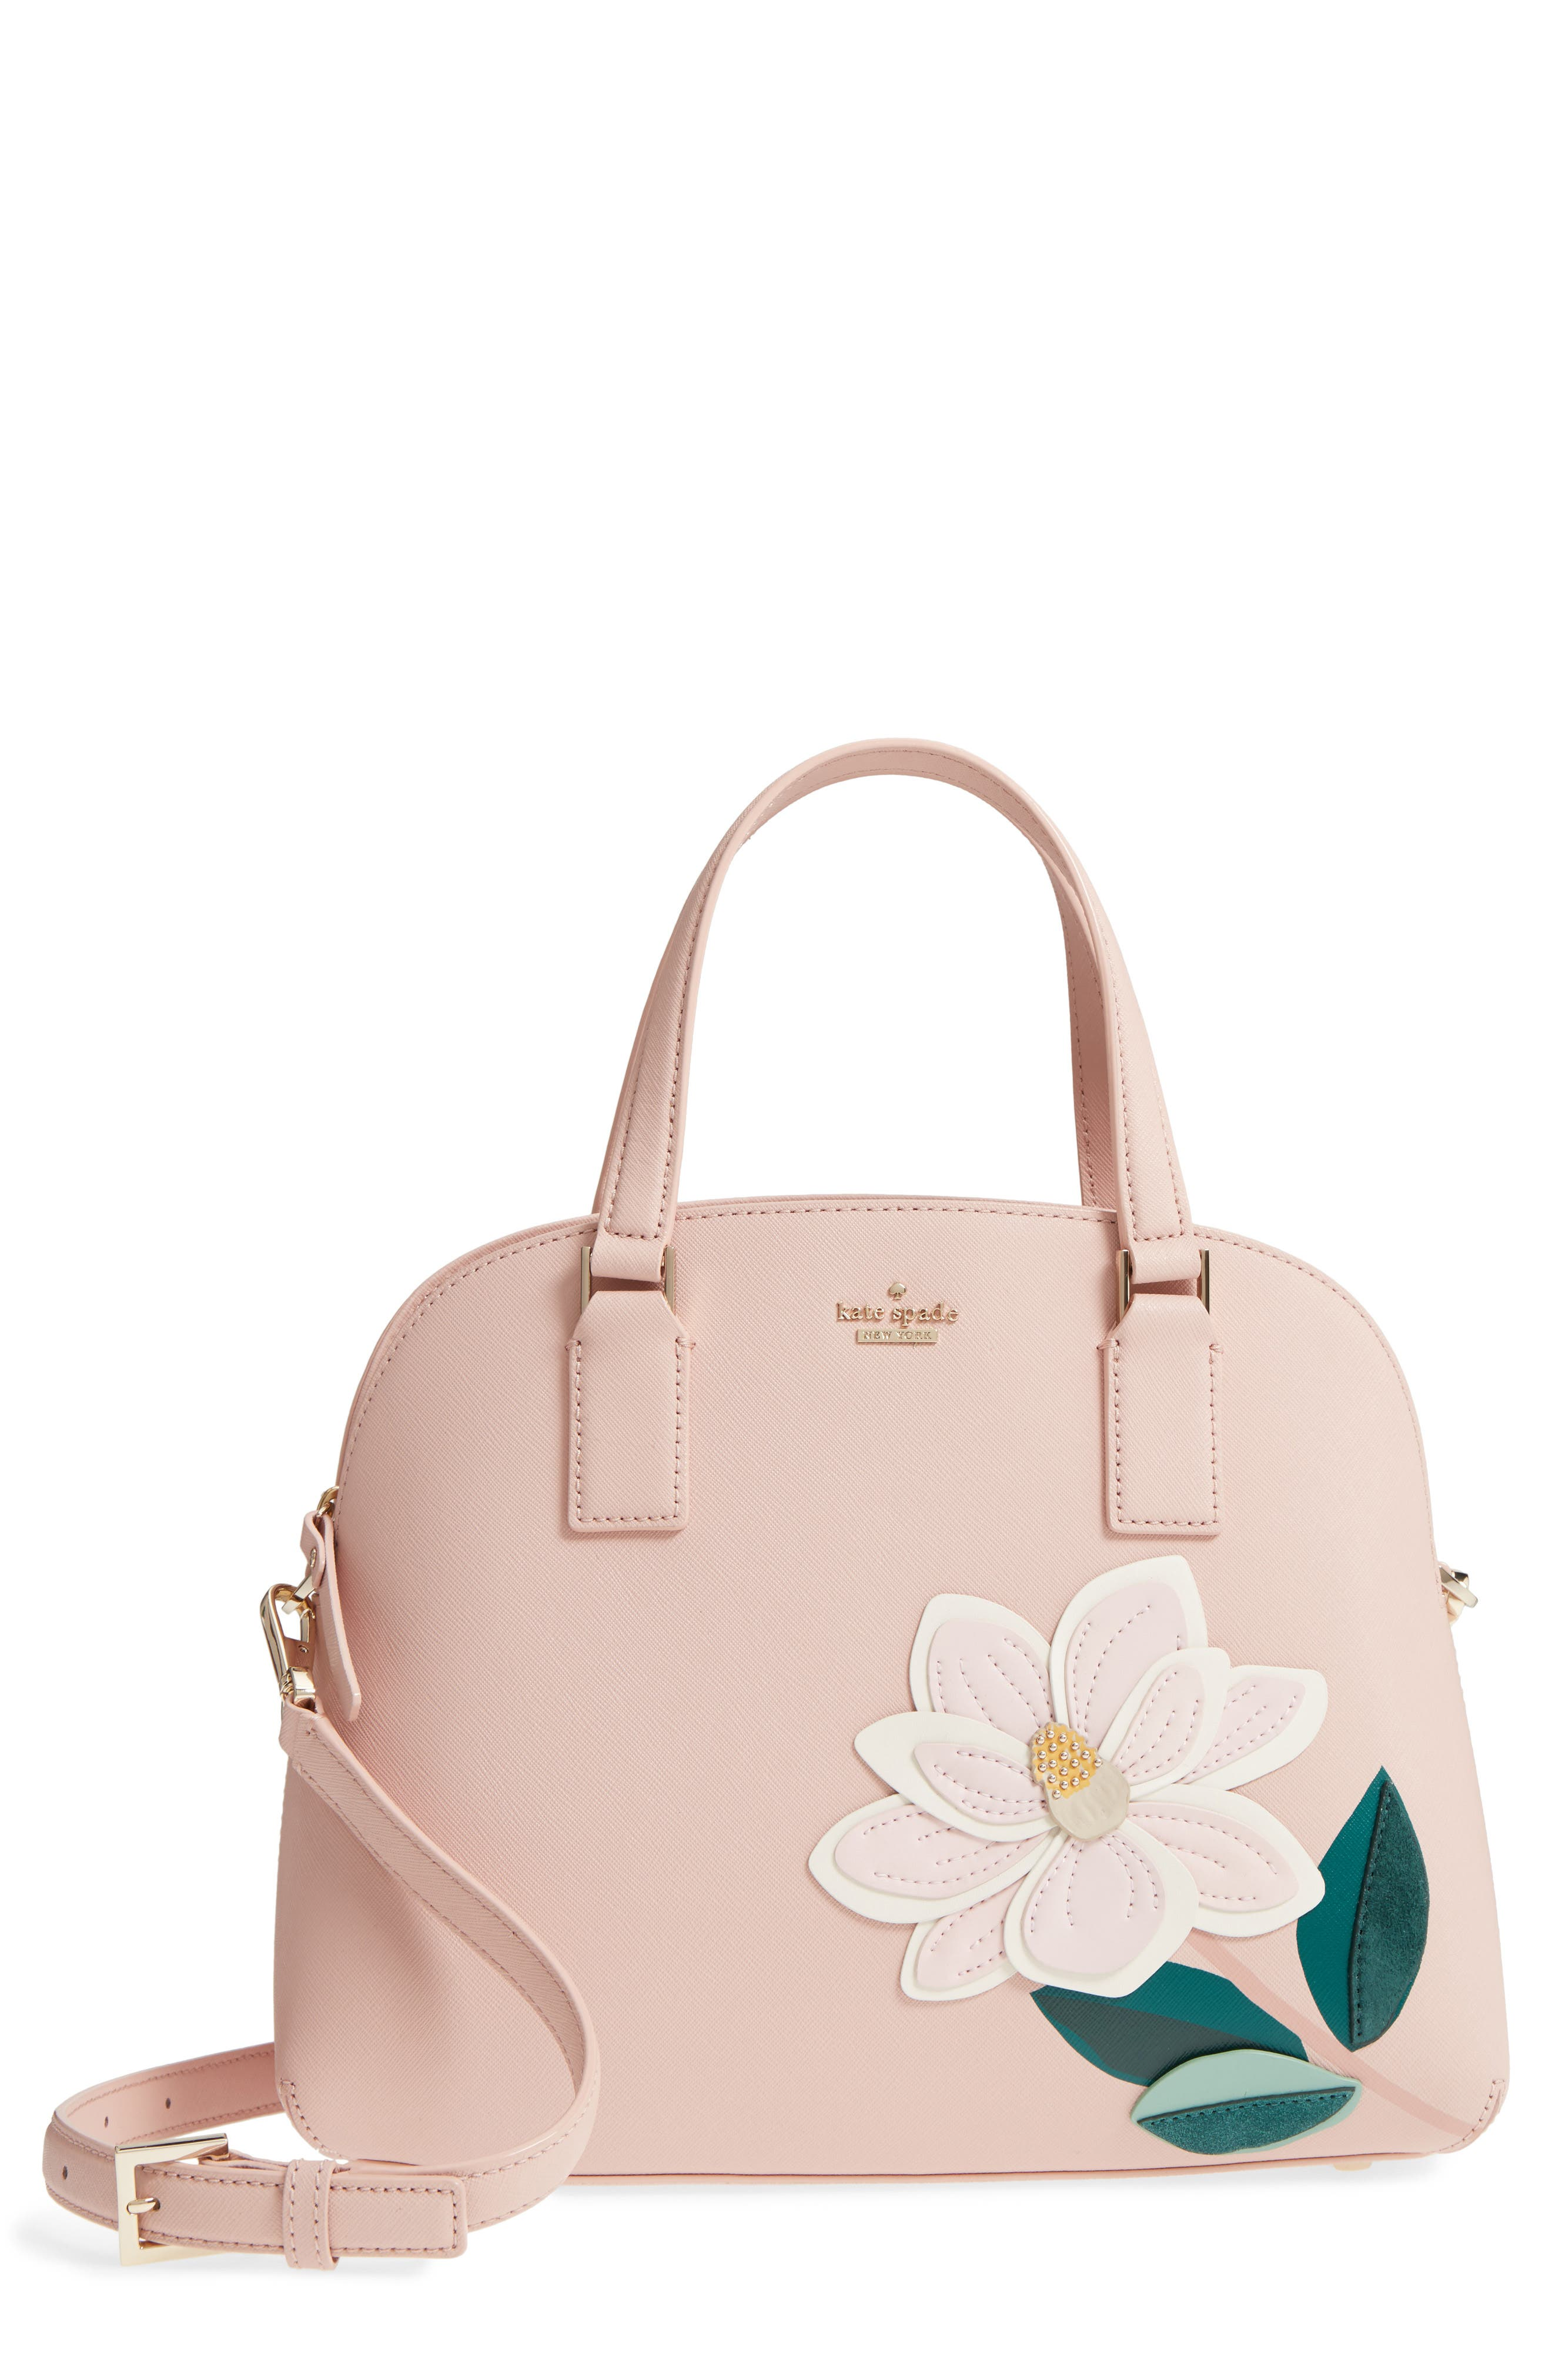 swamped magnolia - lottie leather satchel,                             Main thumbnail 1, color,                             650